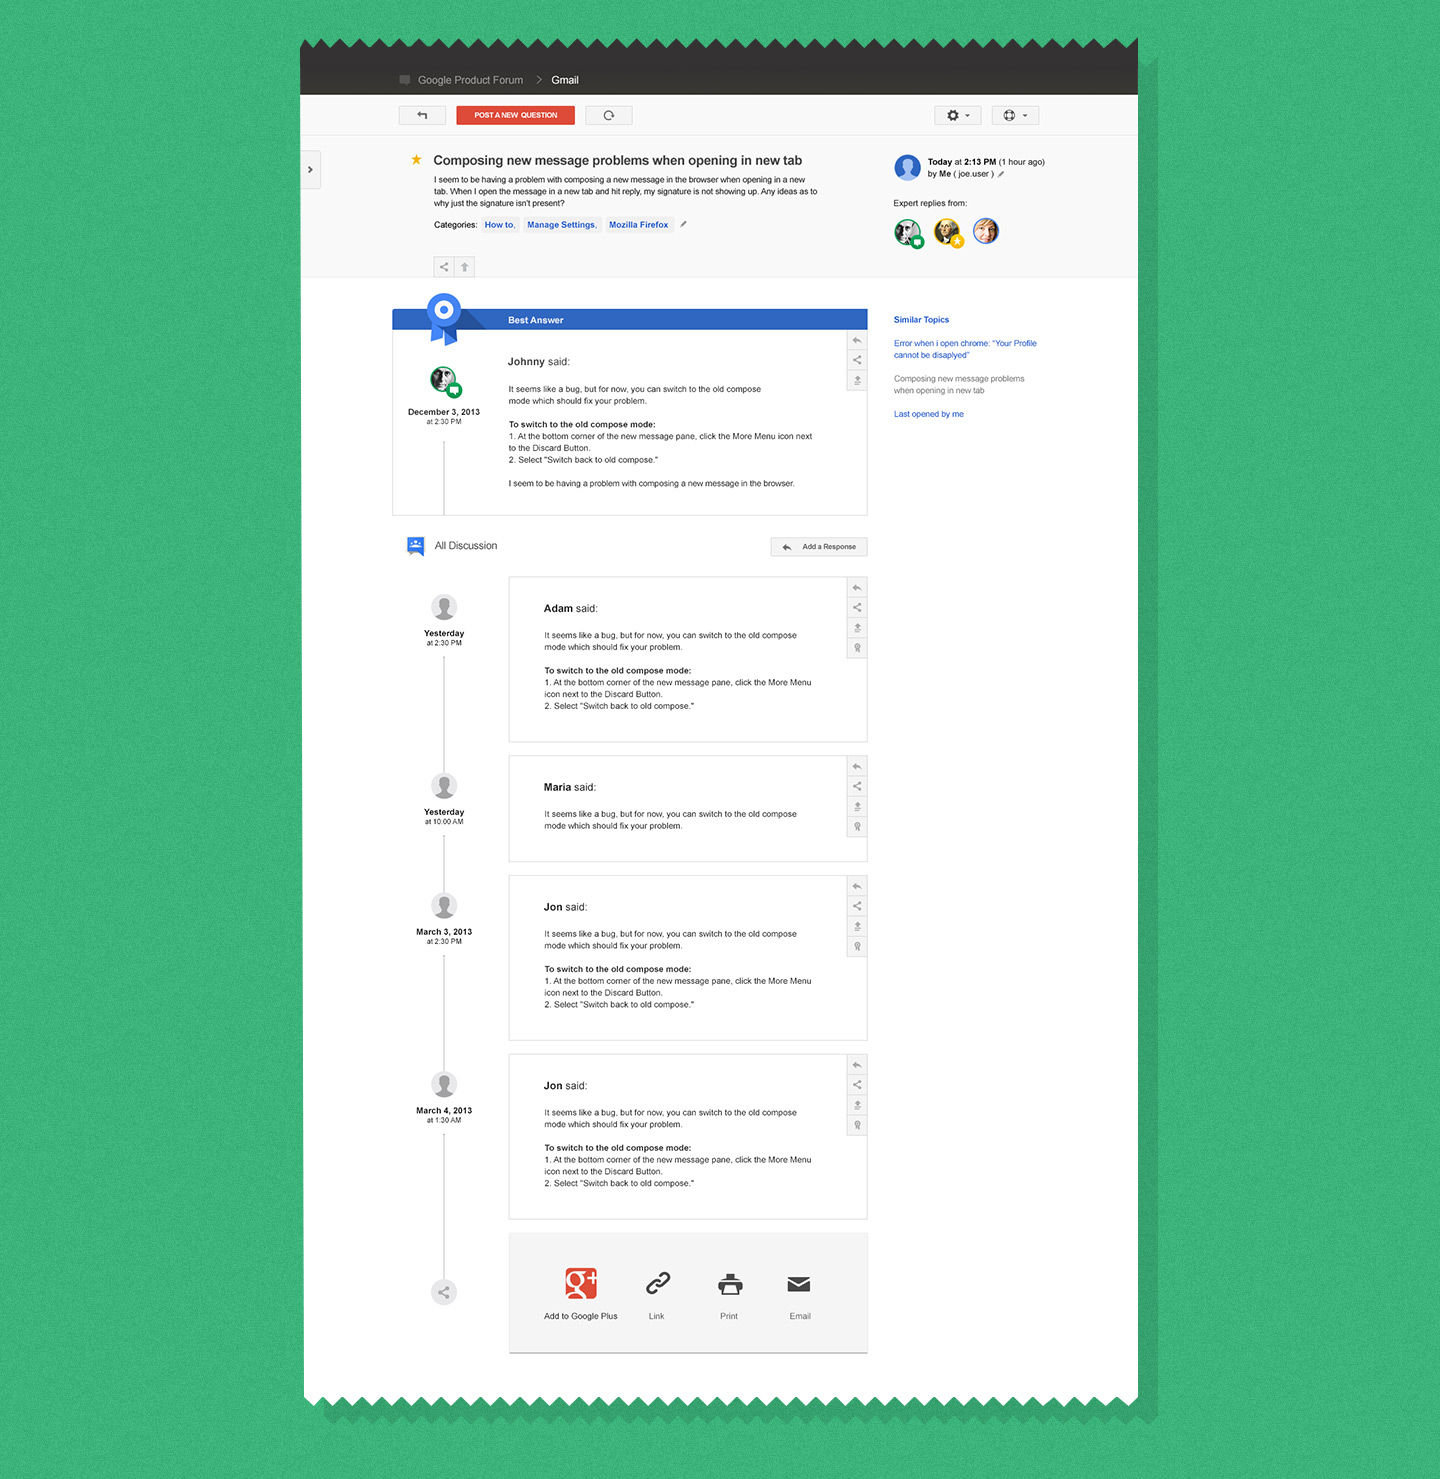 Google-Forums-3